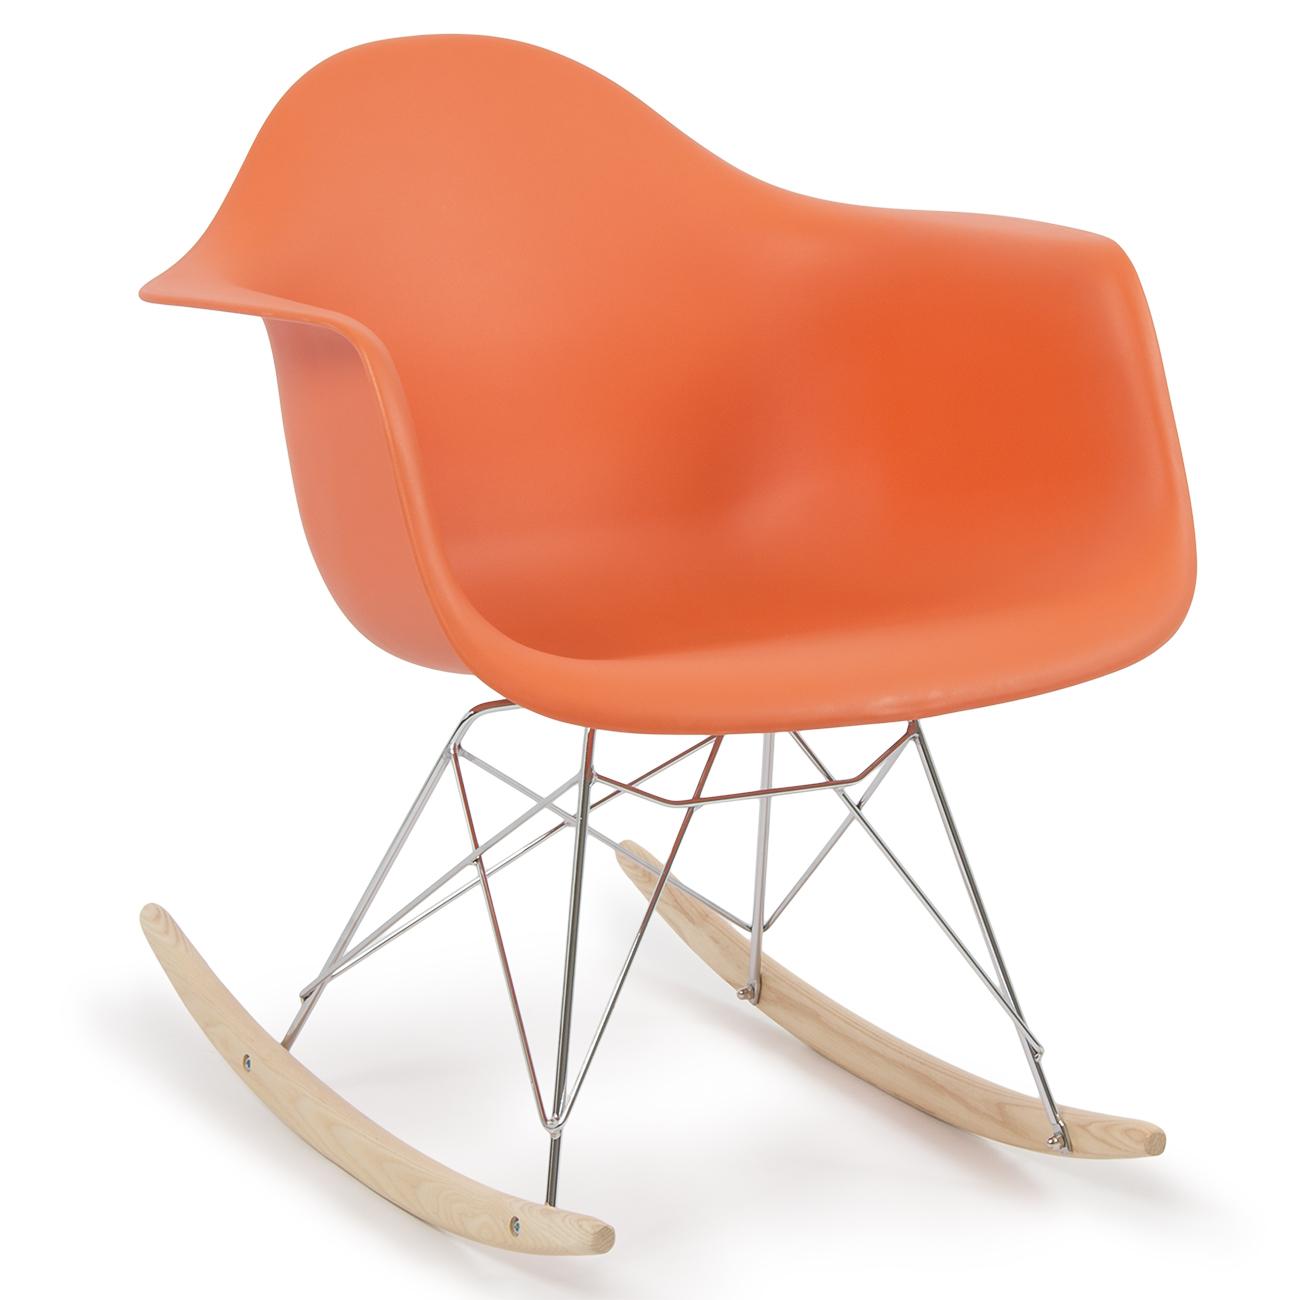 Retro dsw style modern arm chair rar rocker rocking chairs for Rocking chair dsw